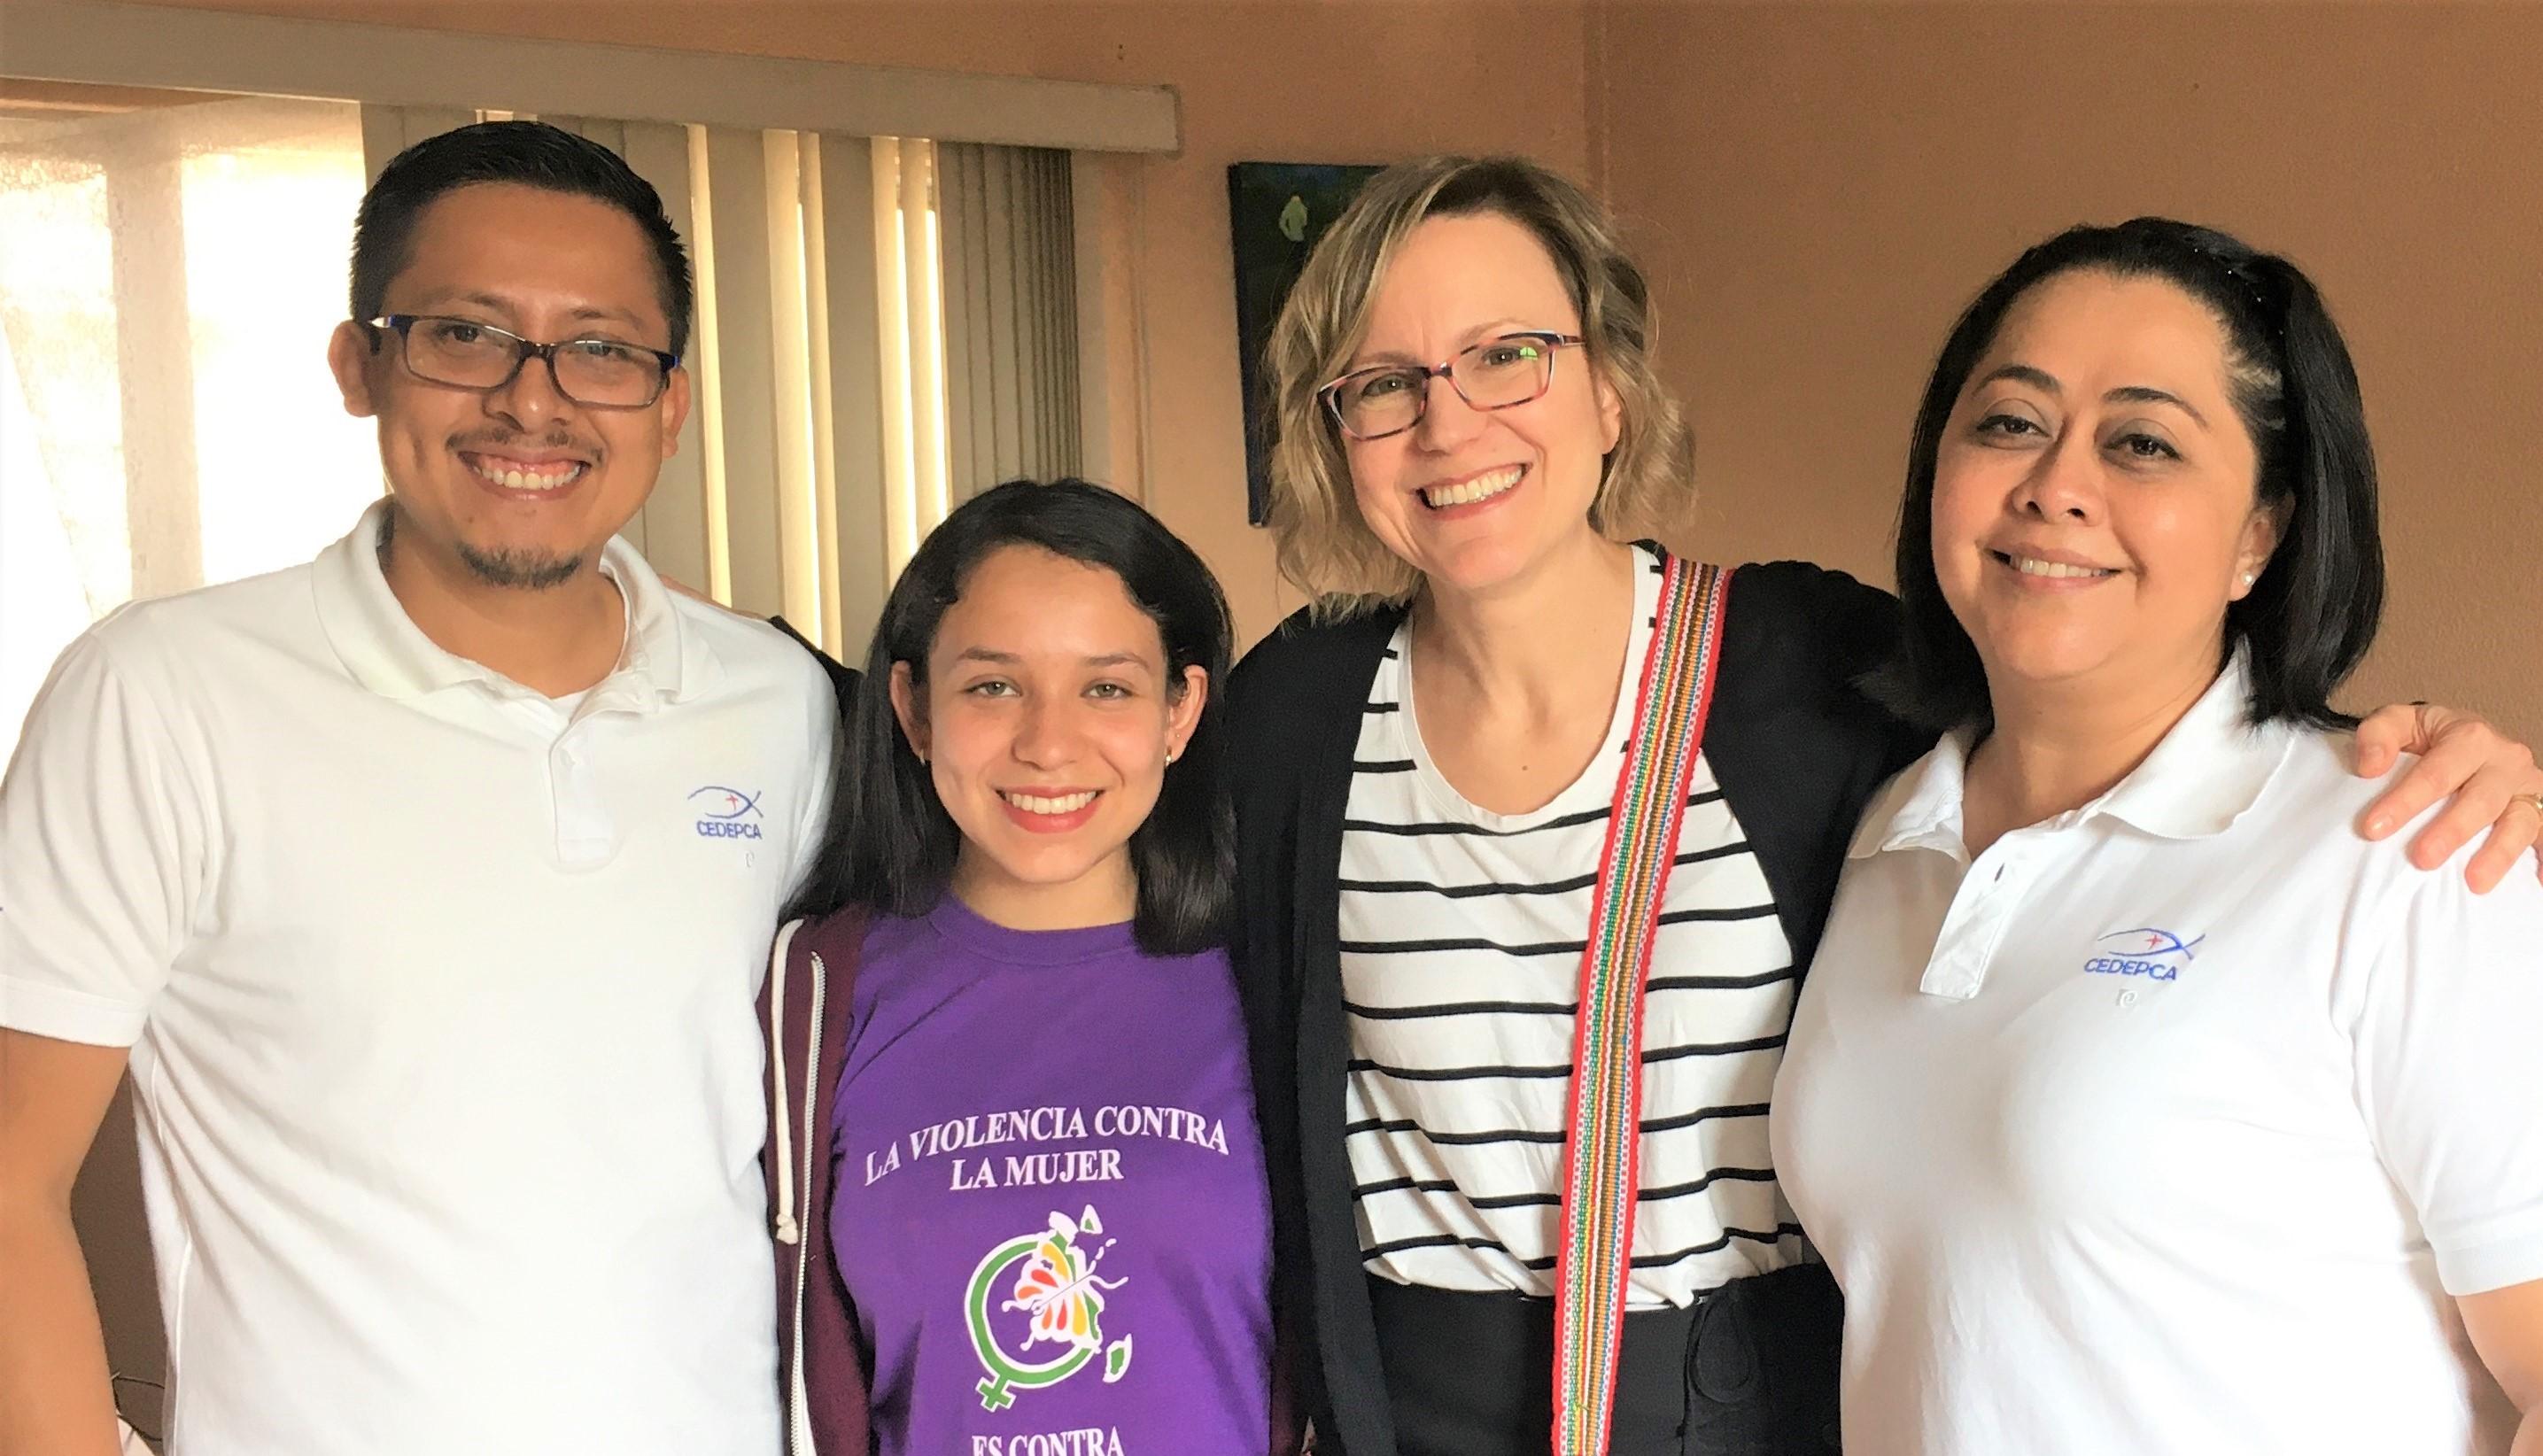 The Intercultural Encounters Staff at CEDEPCA: Esvin Sirin, Rebeca Noriega, Betsey Moe, and Nancy Carrera.